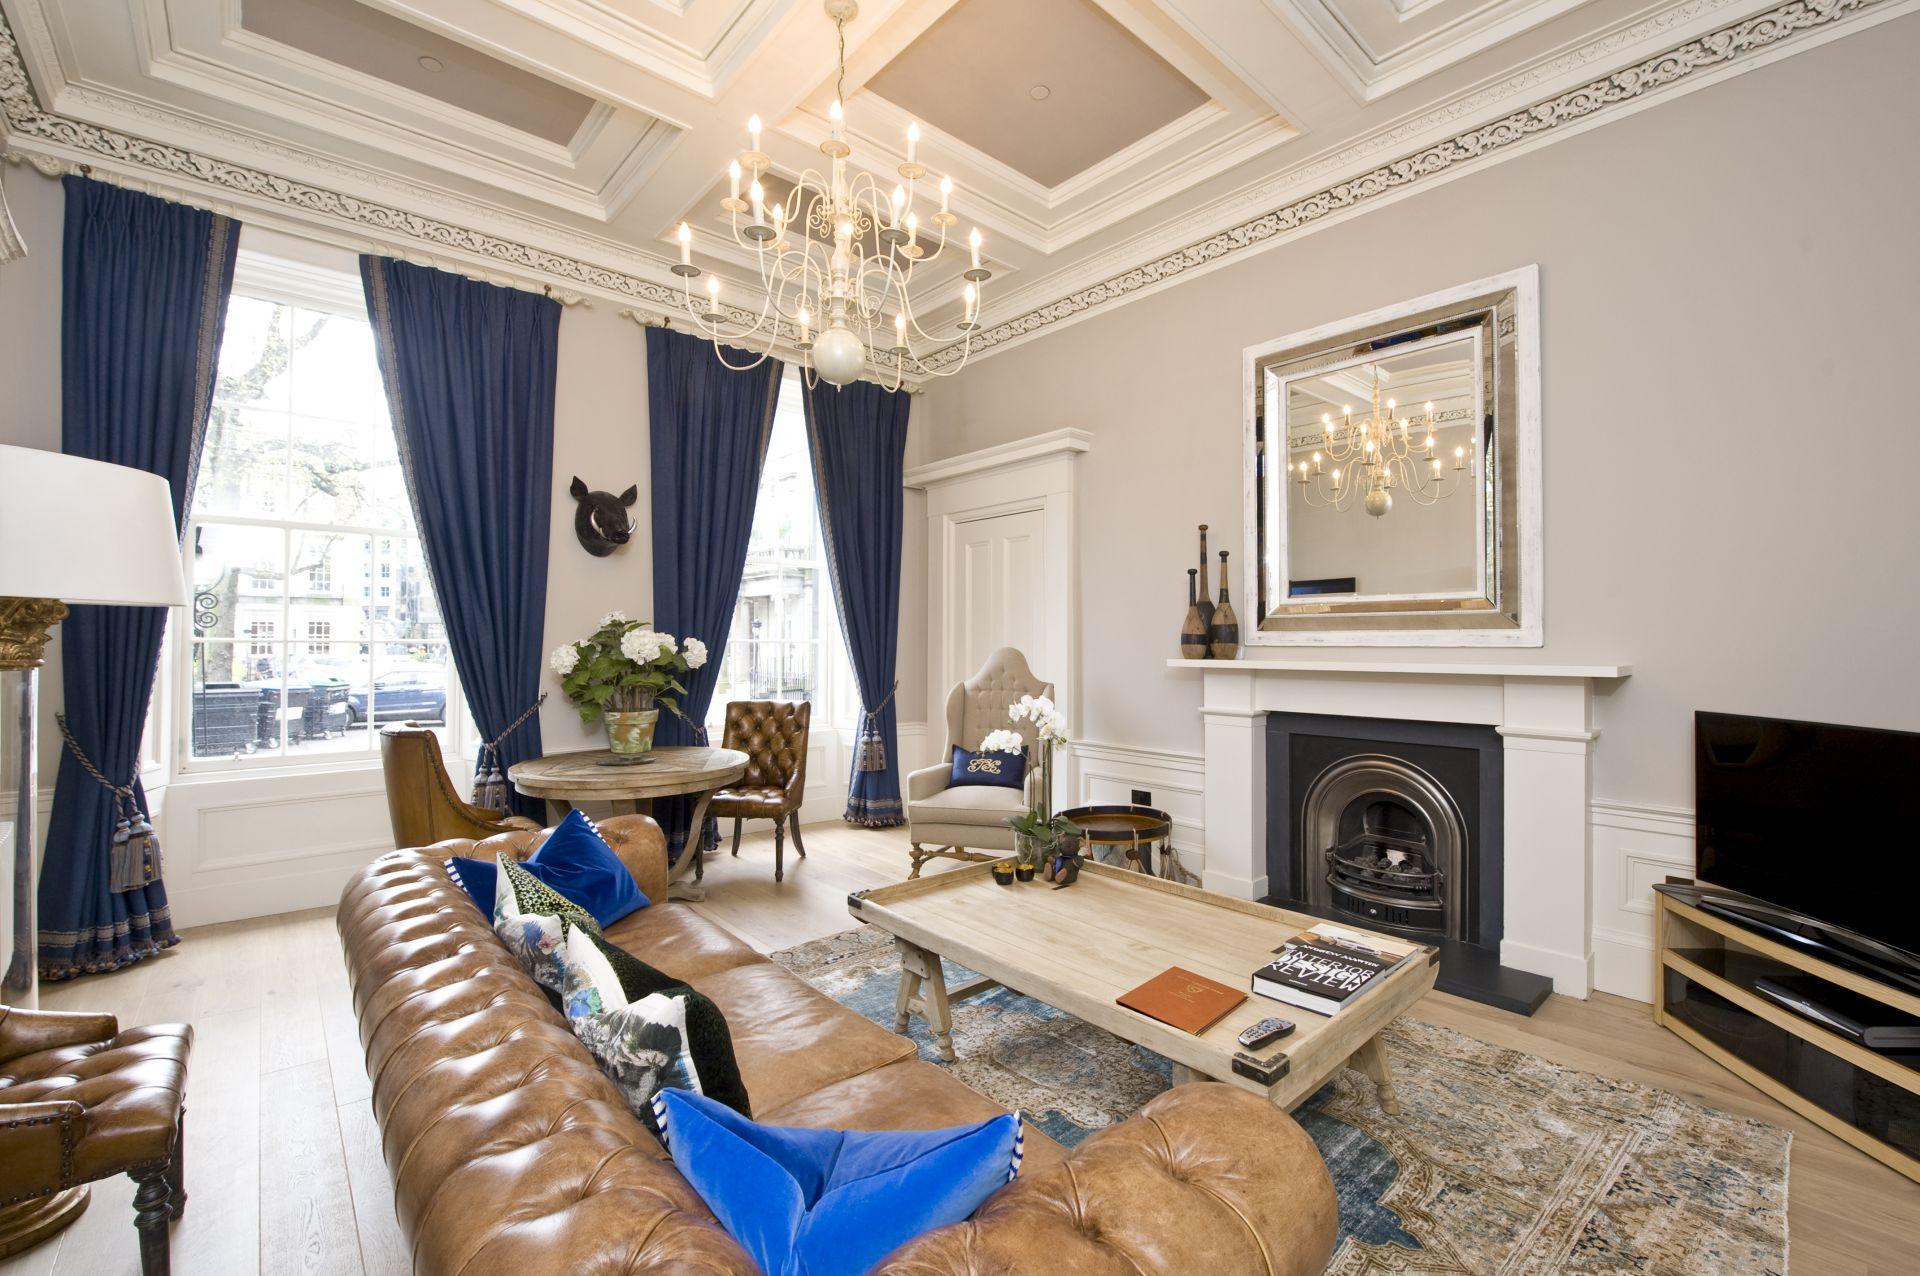 Best Self Catering Apartments In Edinburgh 2019 - Hidden ...